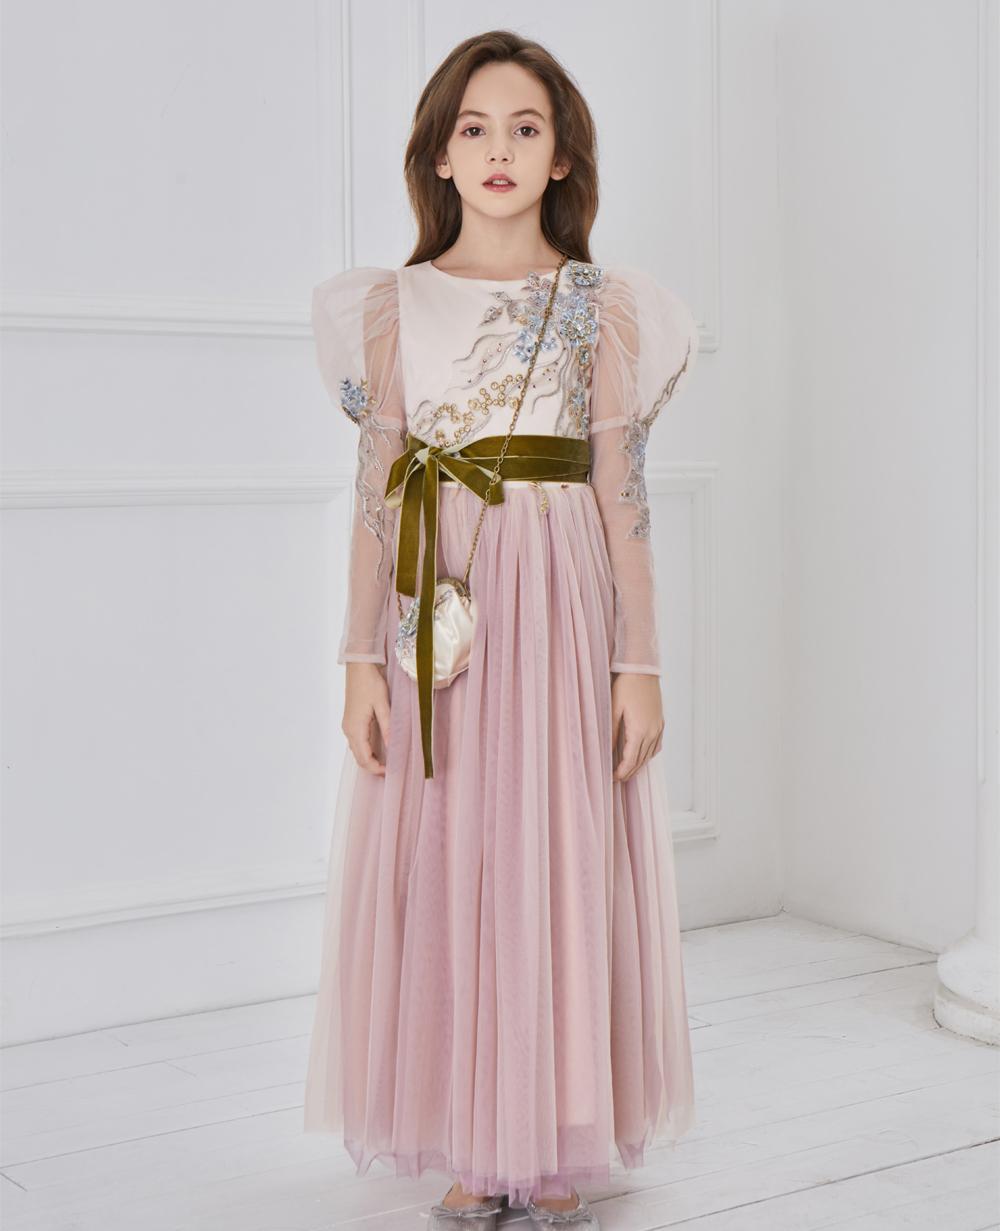 Long sleeve pink  floral dress